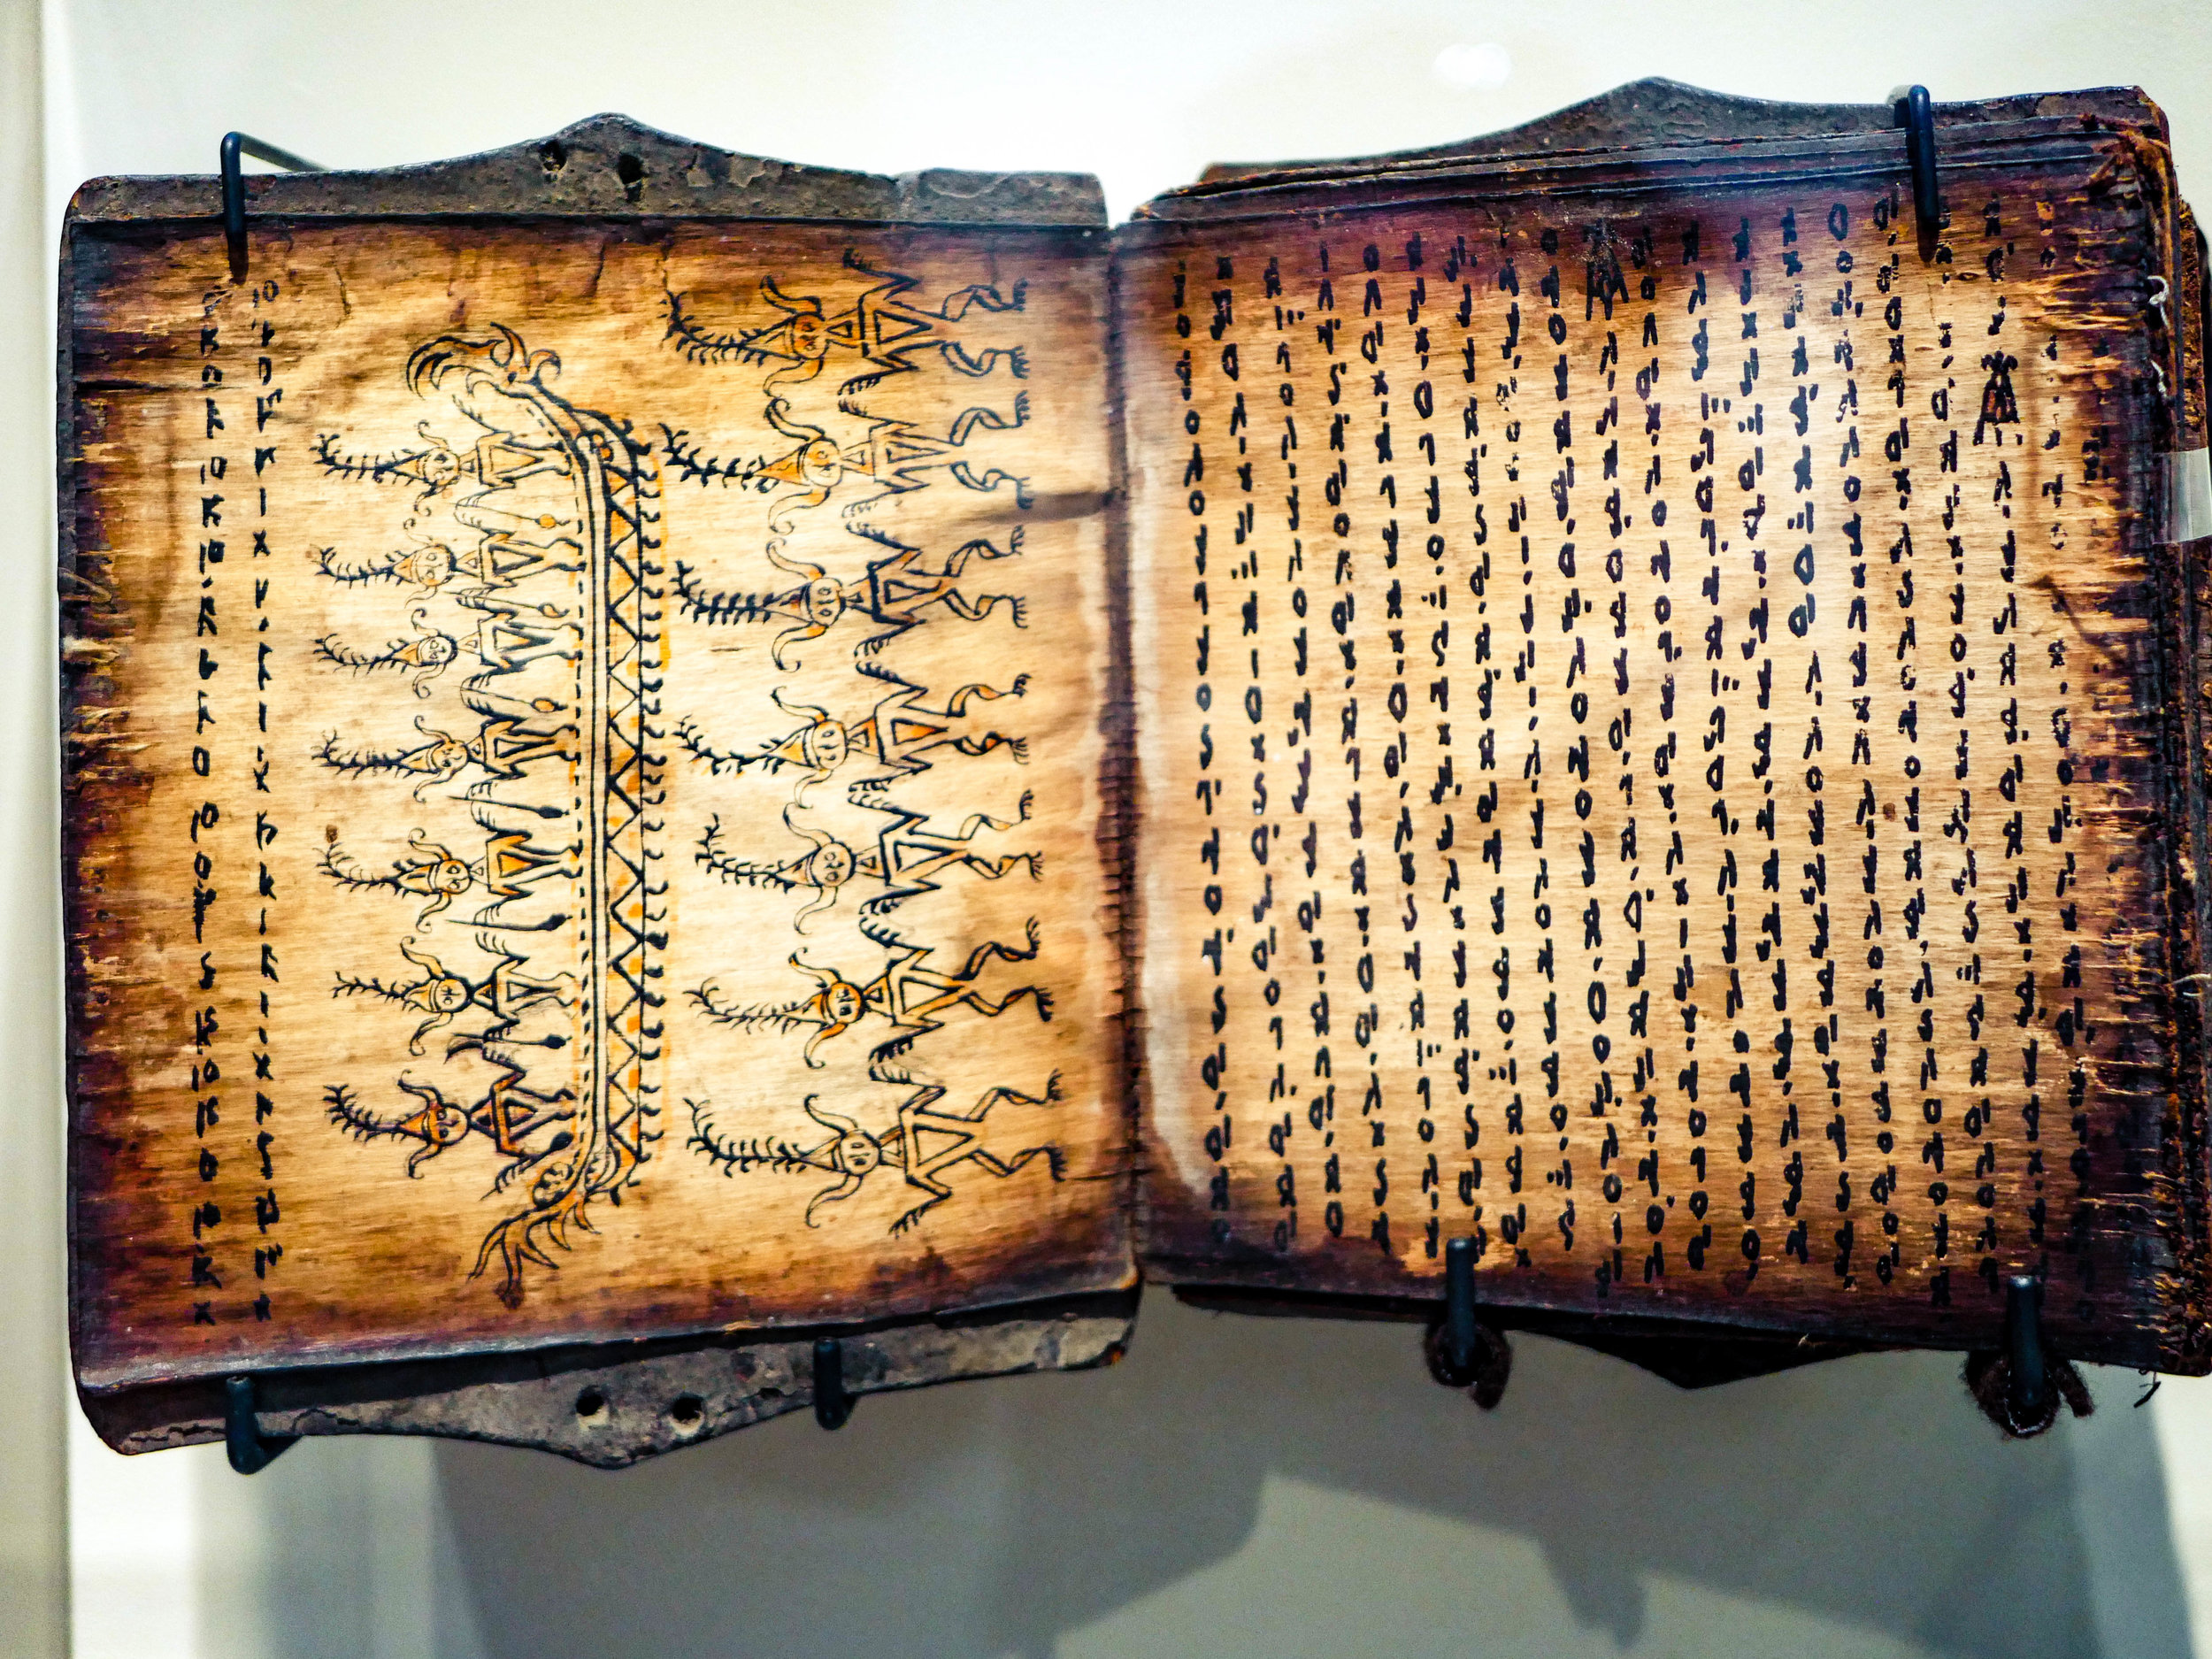 Indonesian manuscript